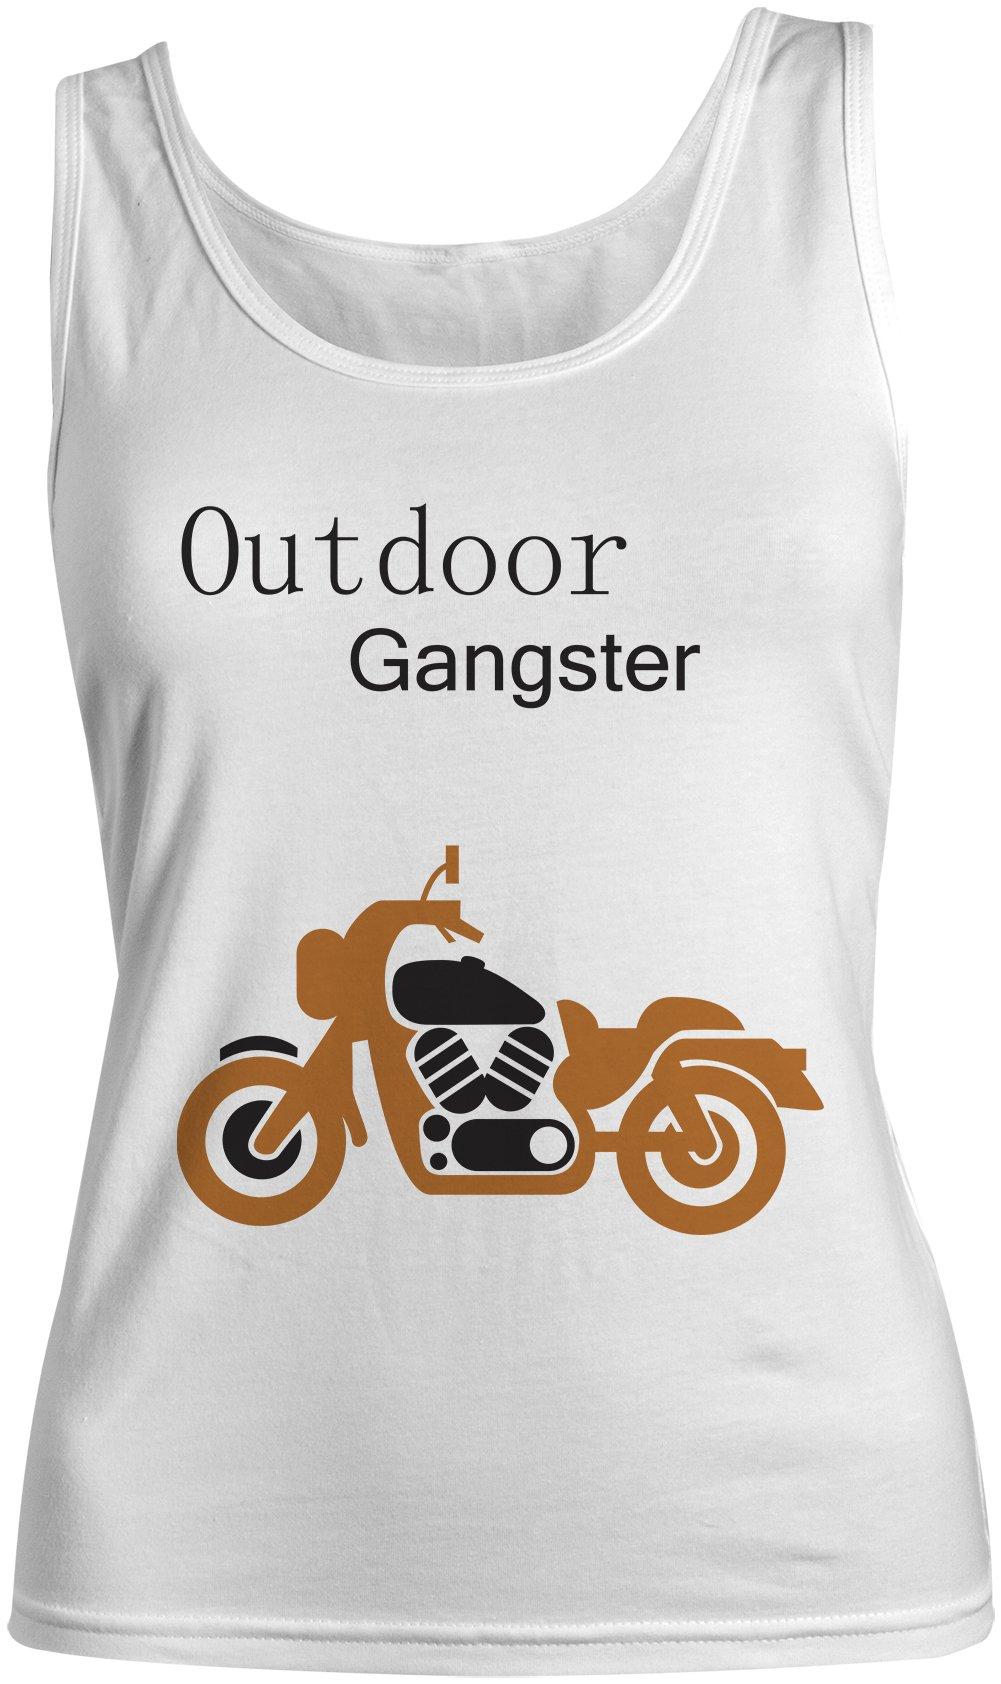 Outdoor Gangster Funny Motorcycle Biker Tank Top Sleeveless Shirt 4355